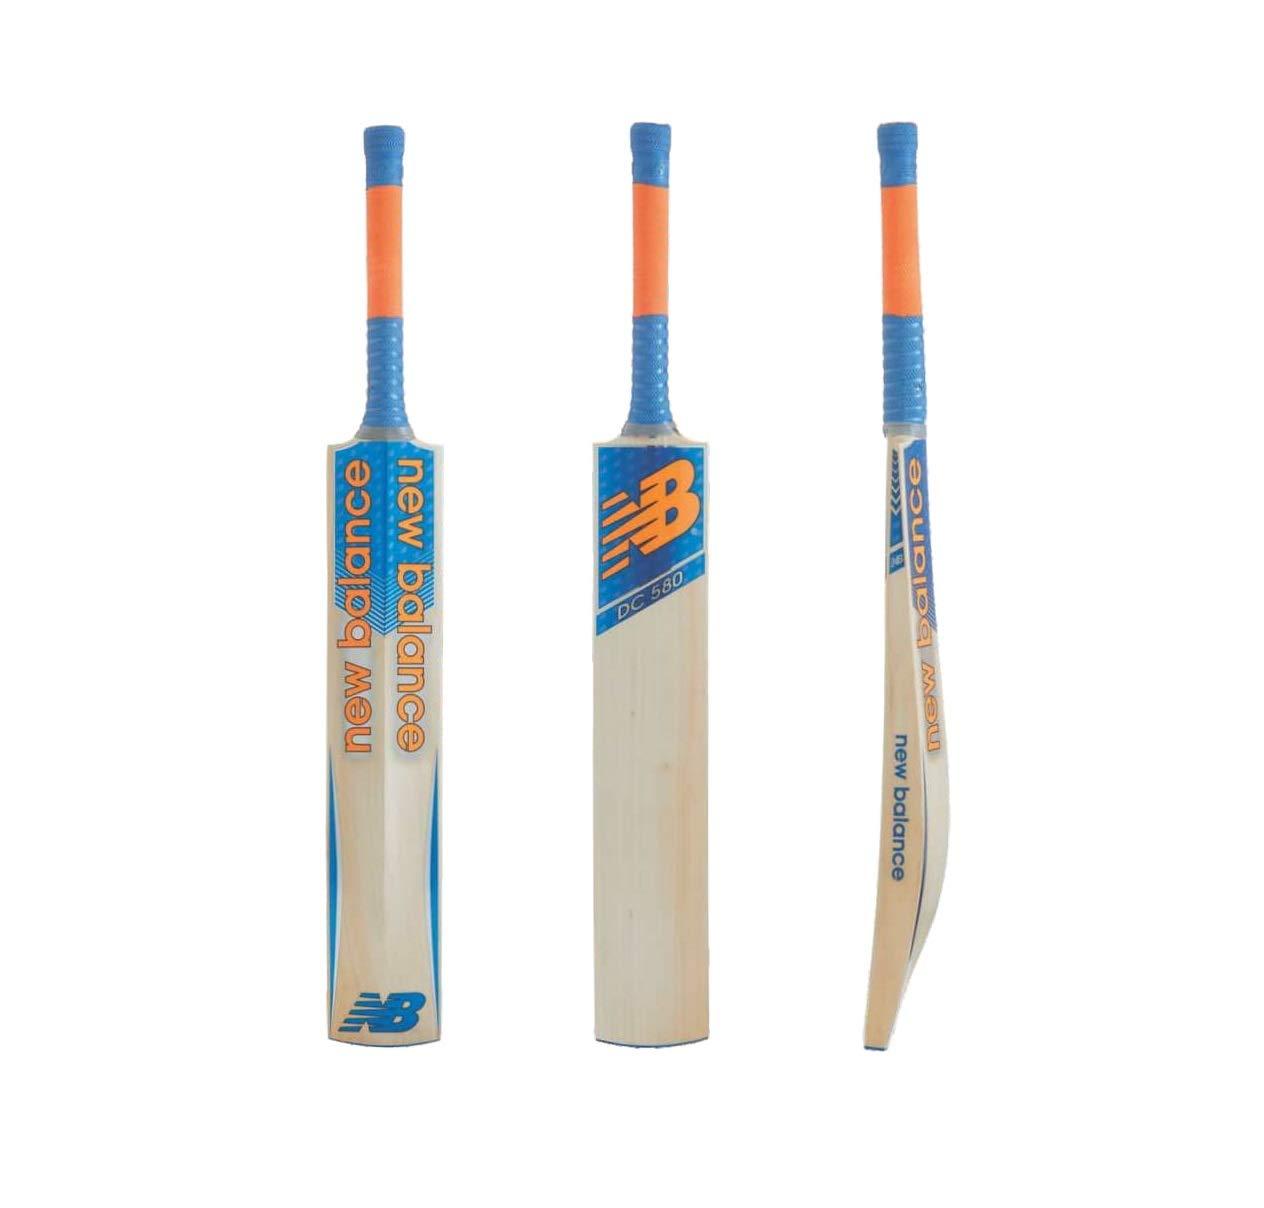 New Balance Nb Dc 580 Cricket Bat : Amazon.in: Sports, Fitness ...